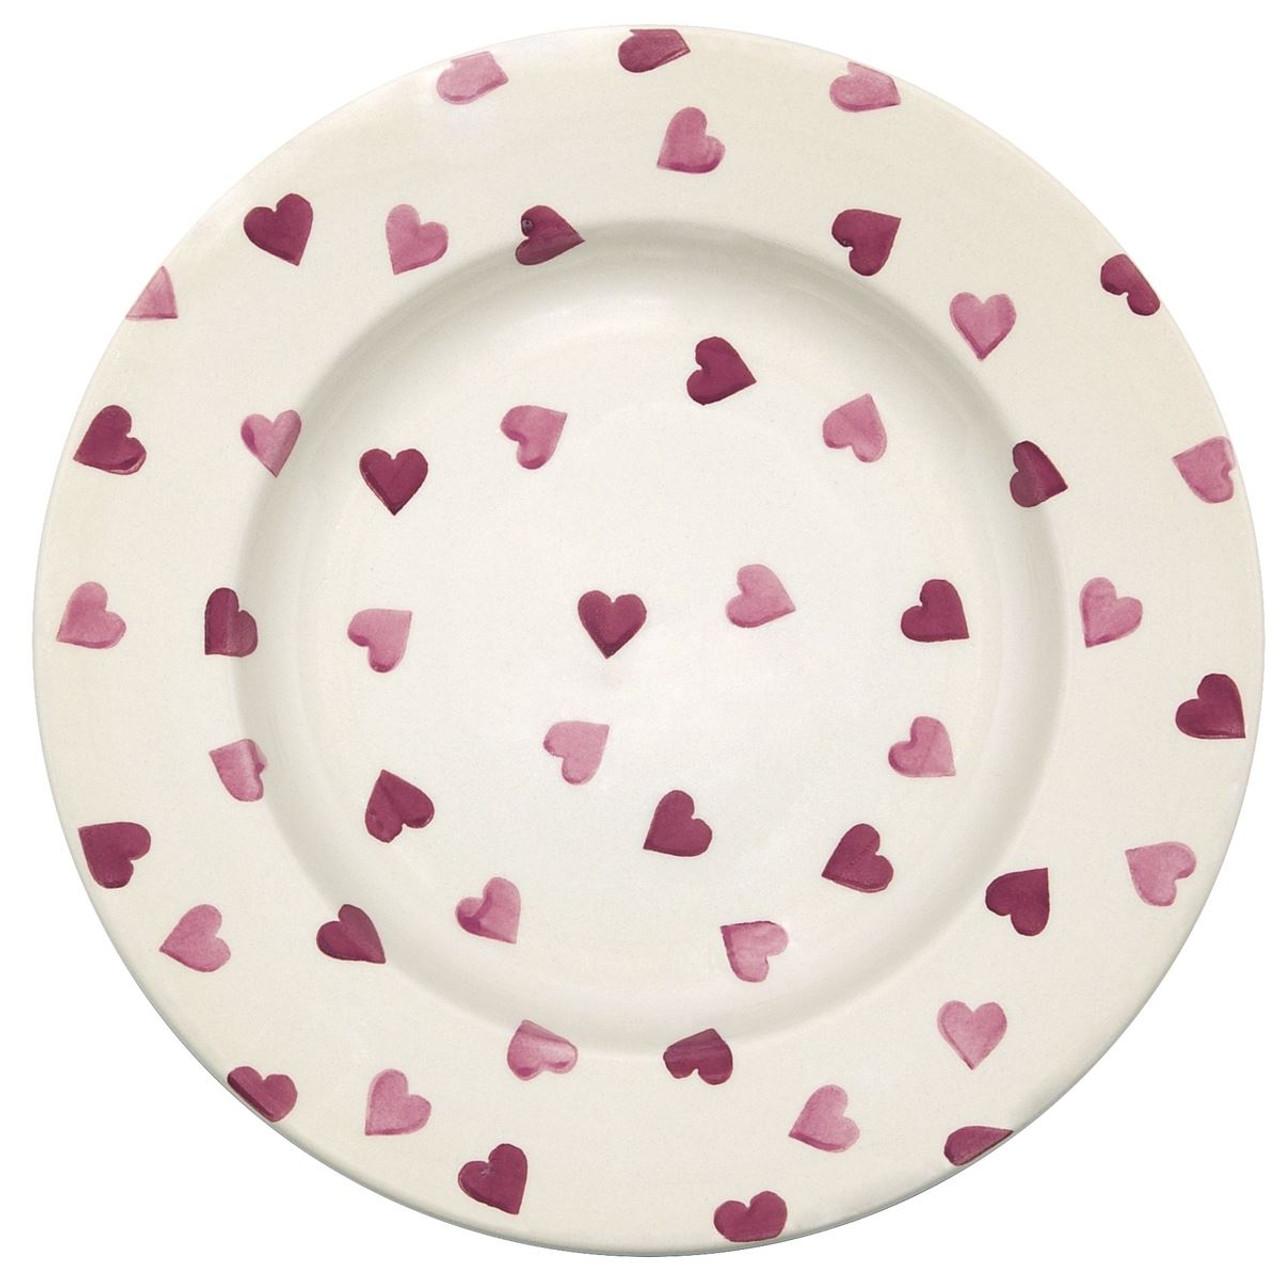 Emma Bridgewater Pink Hearts 10.5 Inch Plate